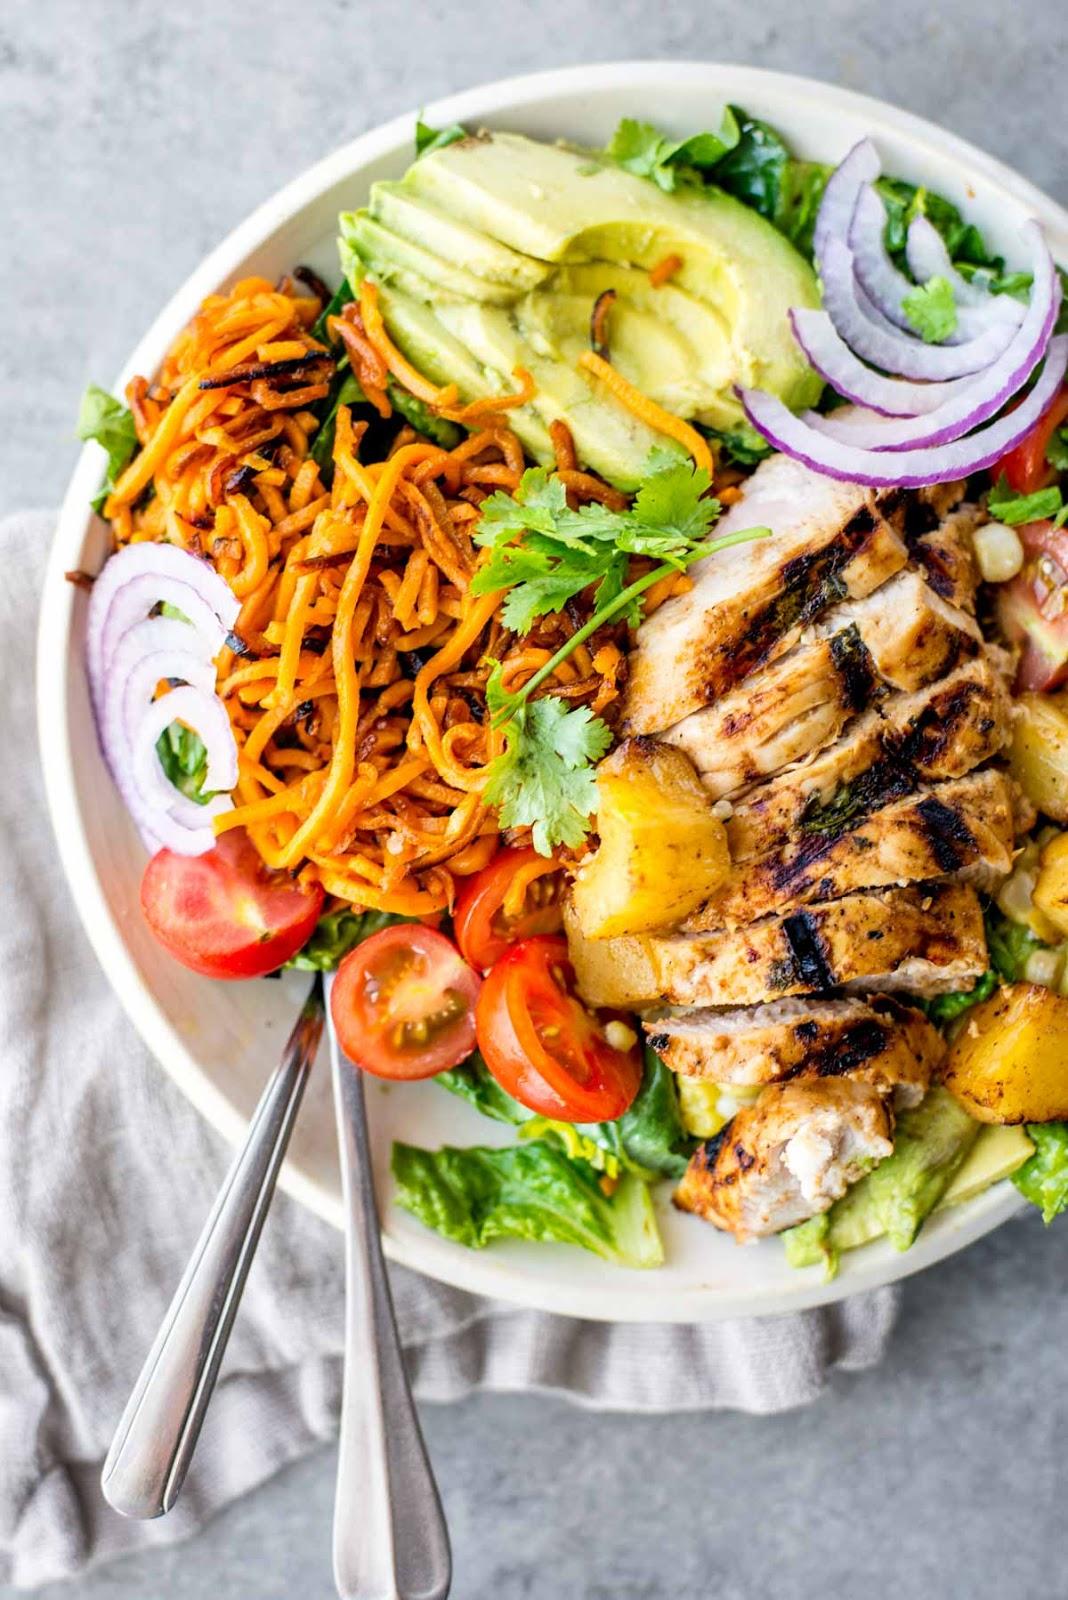 Eliya Melting Pot or Salad Bowl